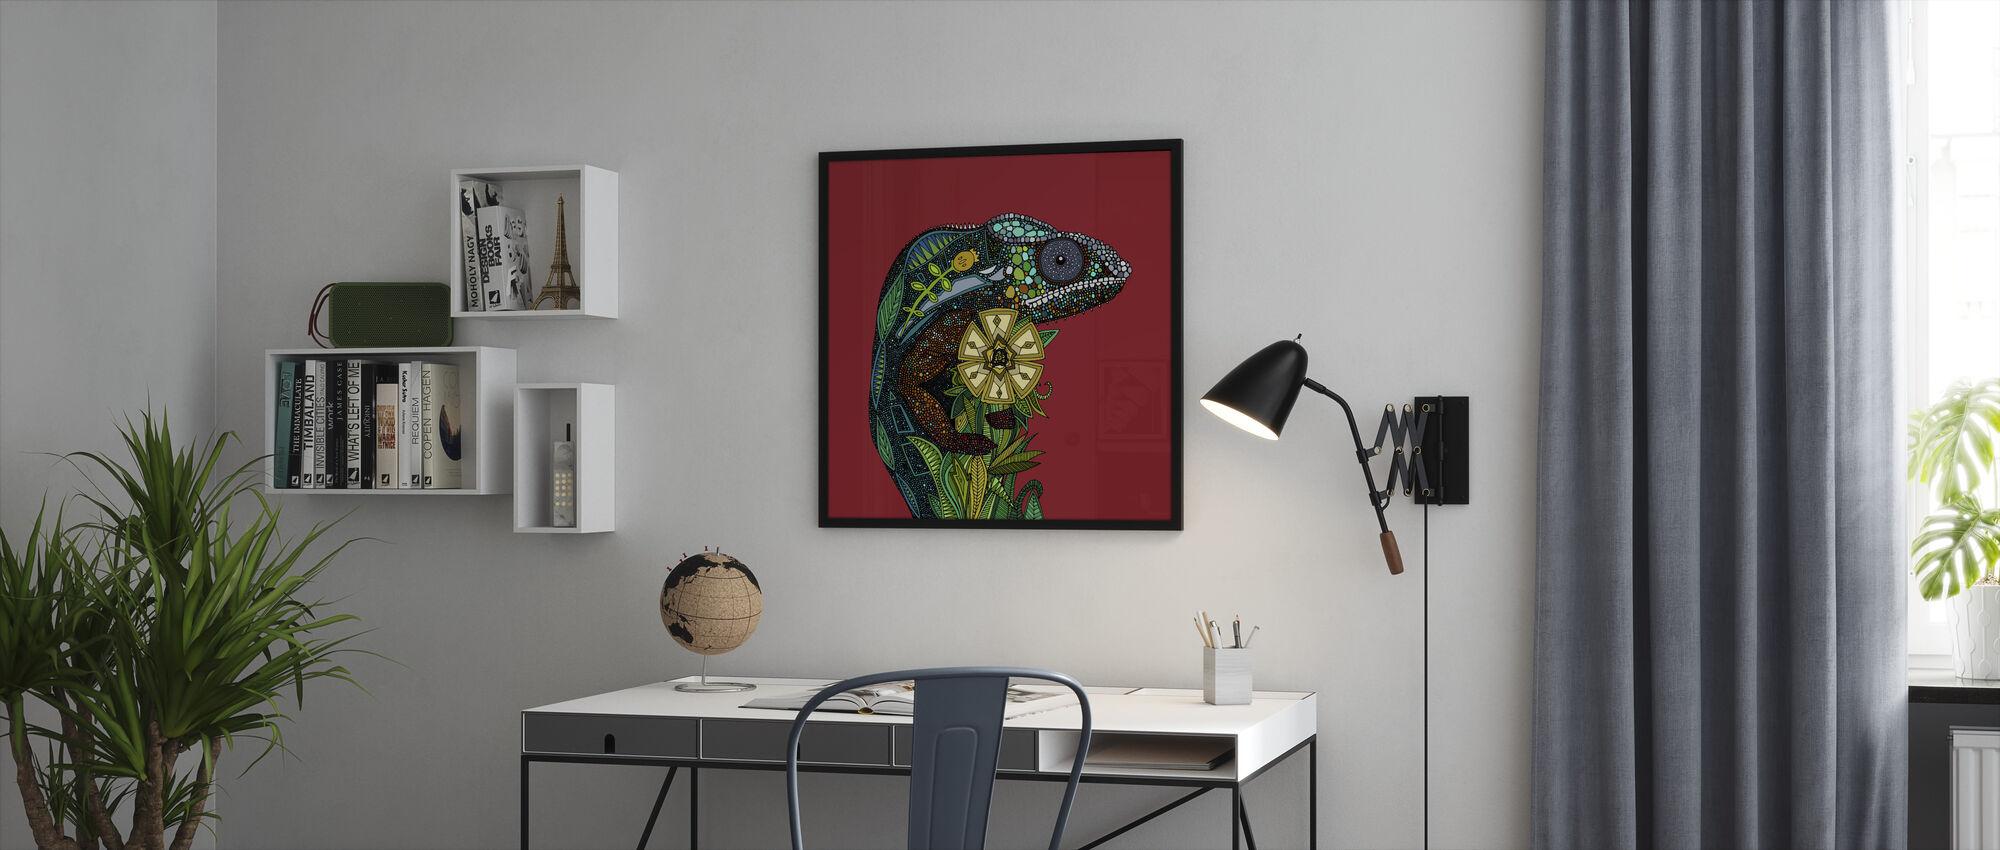 Kameleont - Inramad tavla - Kontor